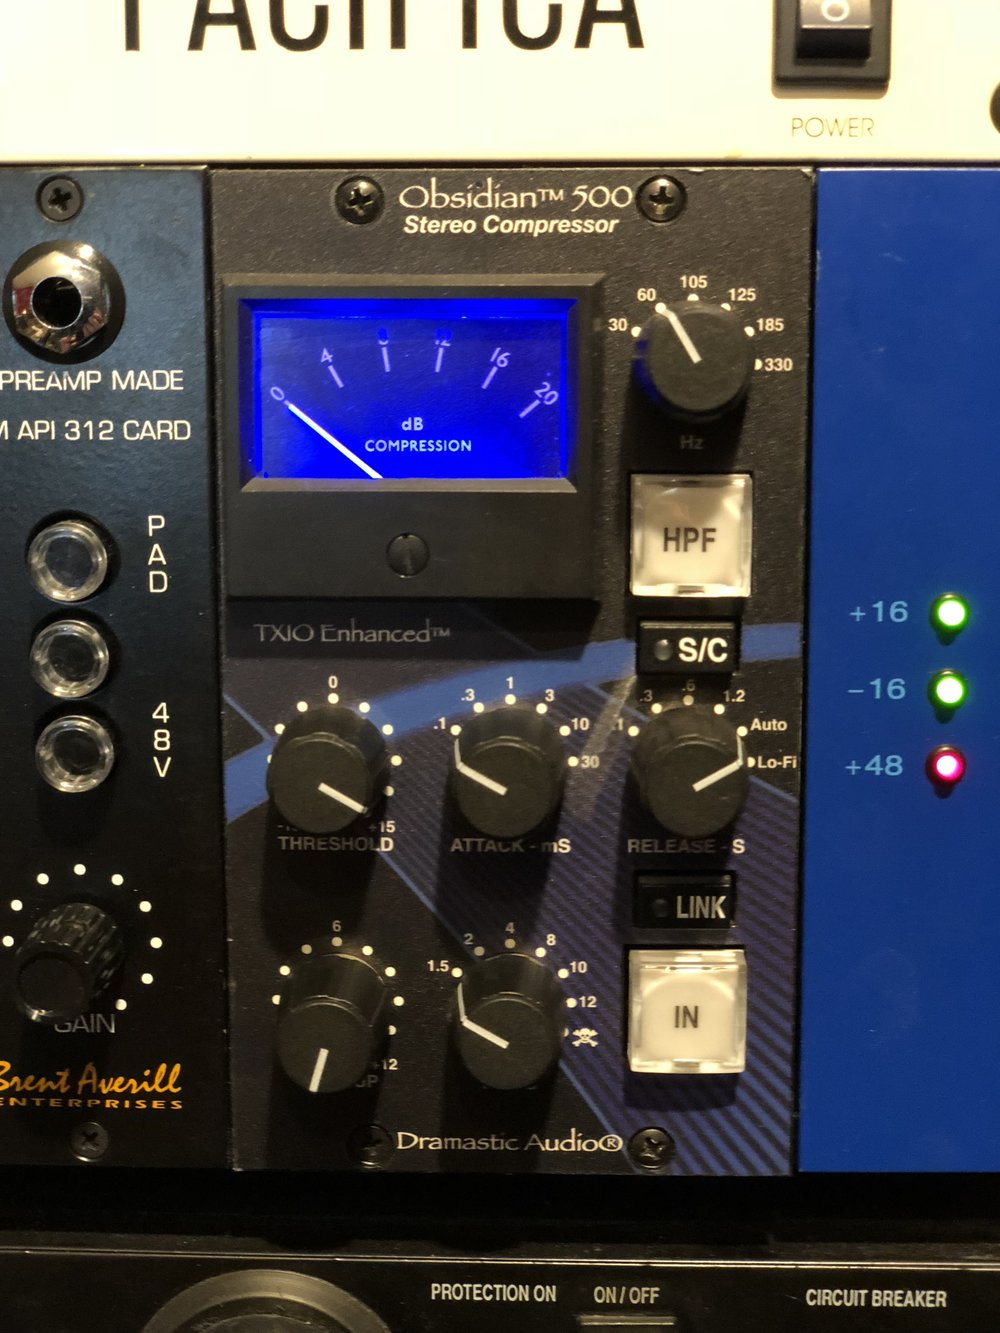 Dramastic Audio Obsidian 500